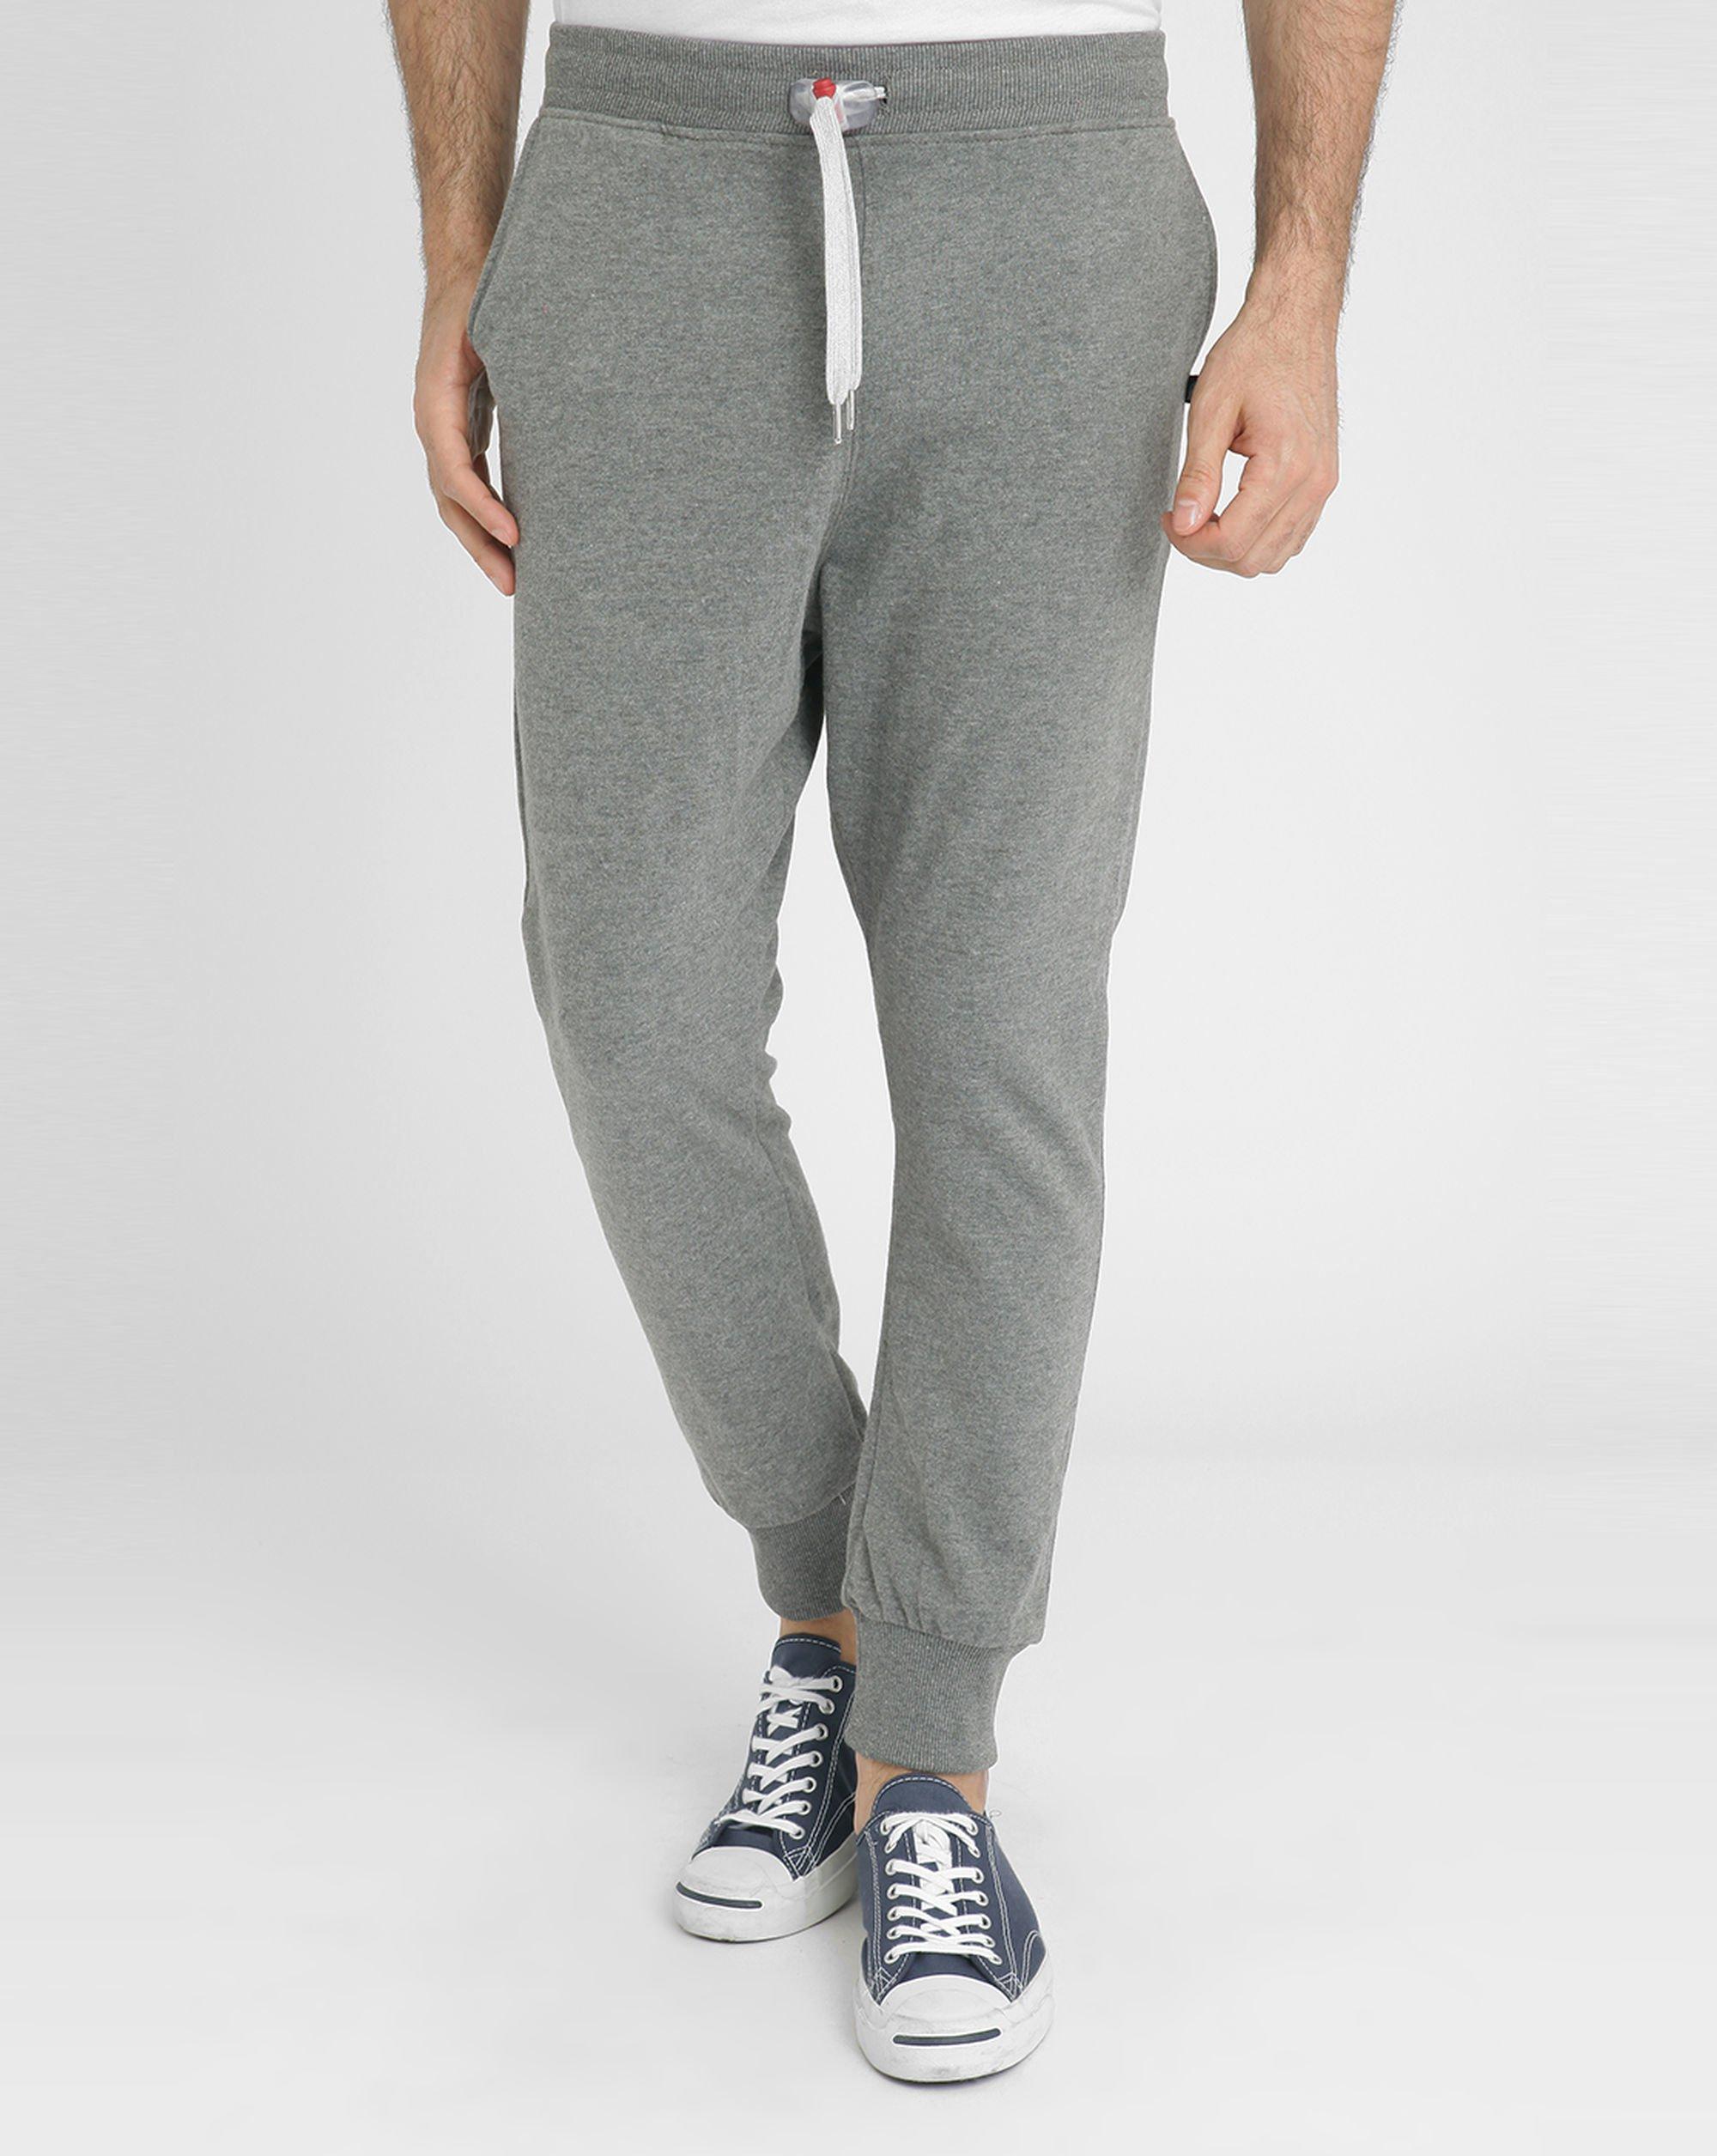 Sweet pants Dark Mottled Grey Loose-fit Joggers in Gray ...